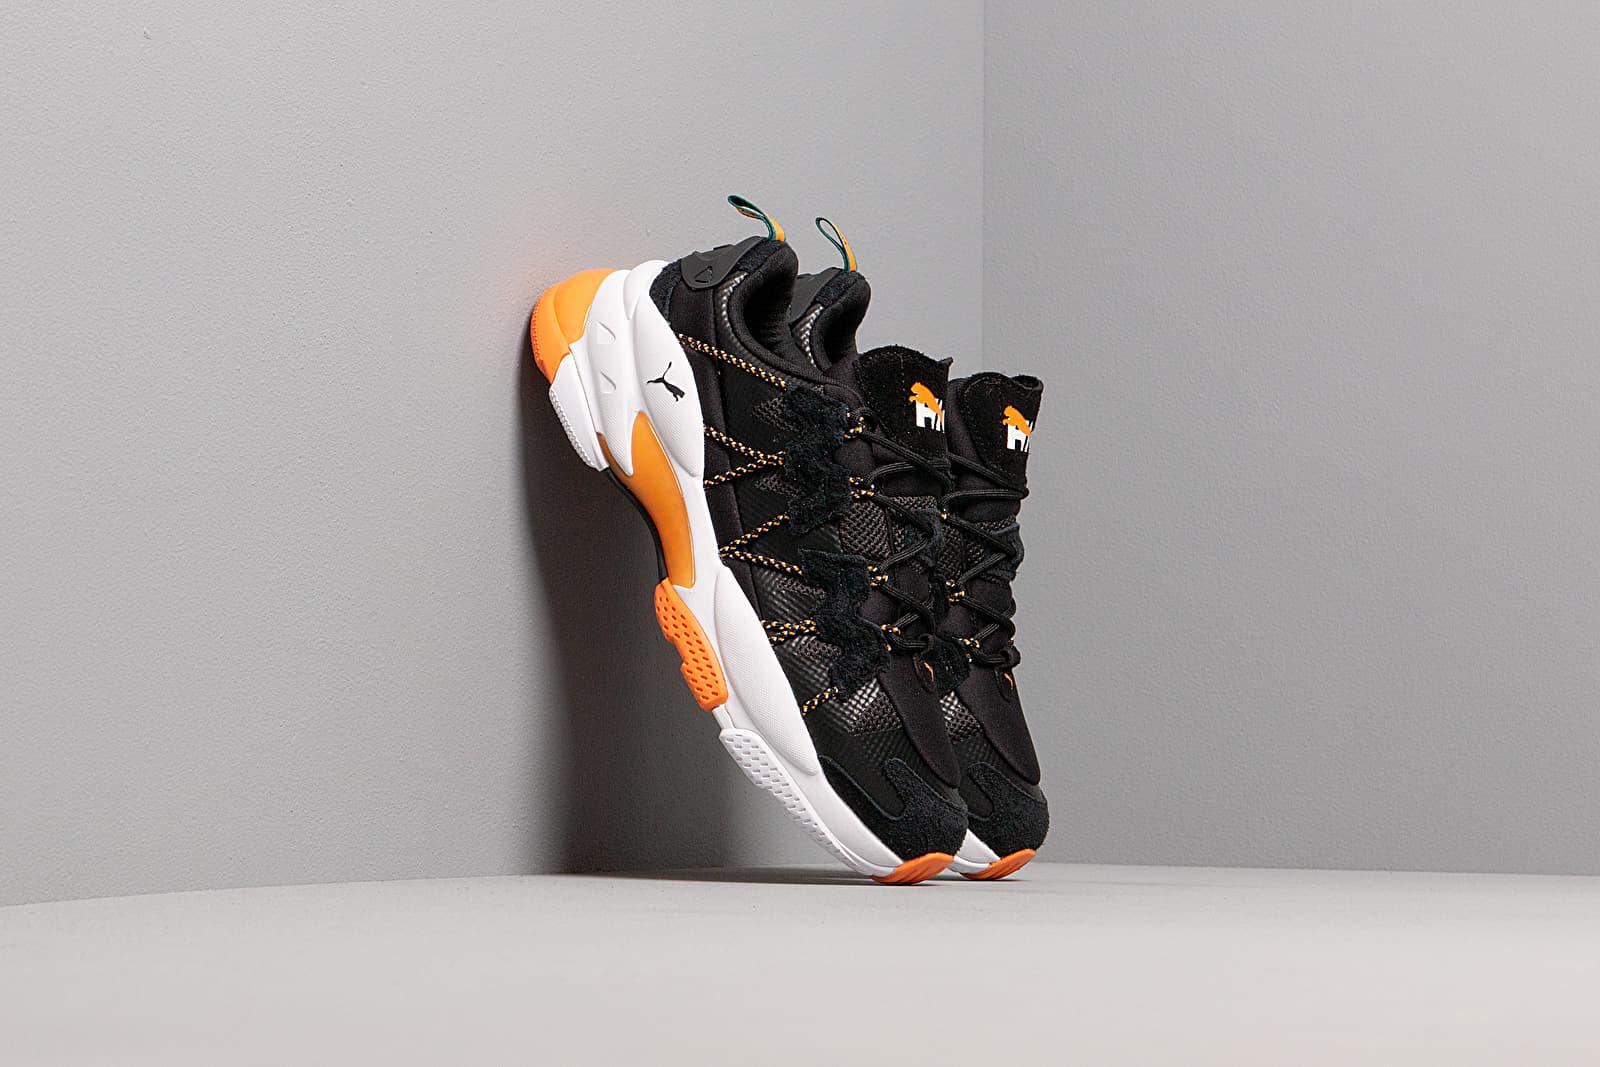 Men's shoes Puma x Helly Hansen LQD Cell Omega Puma Black